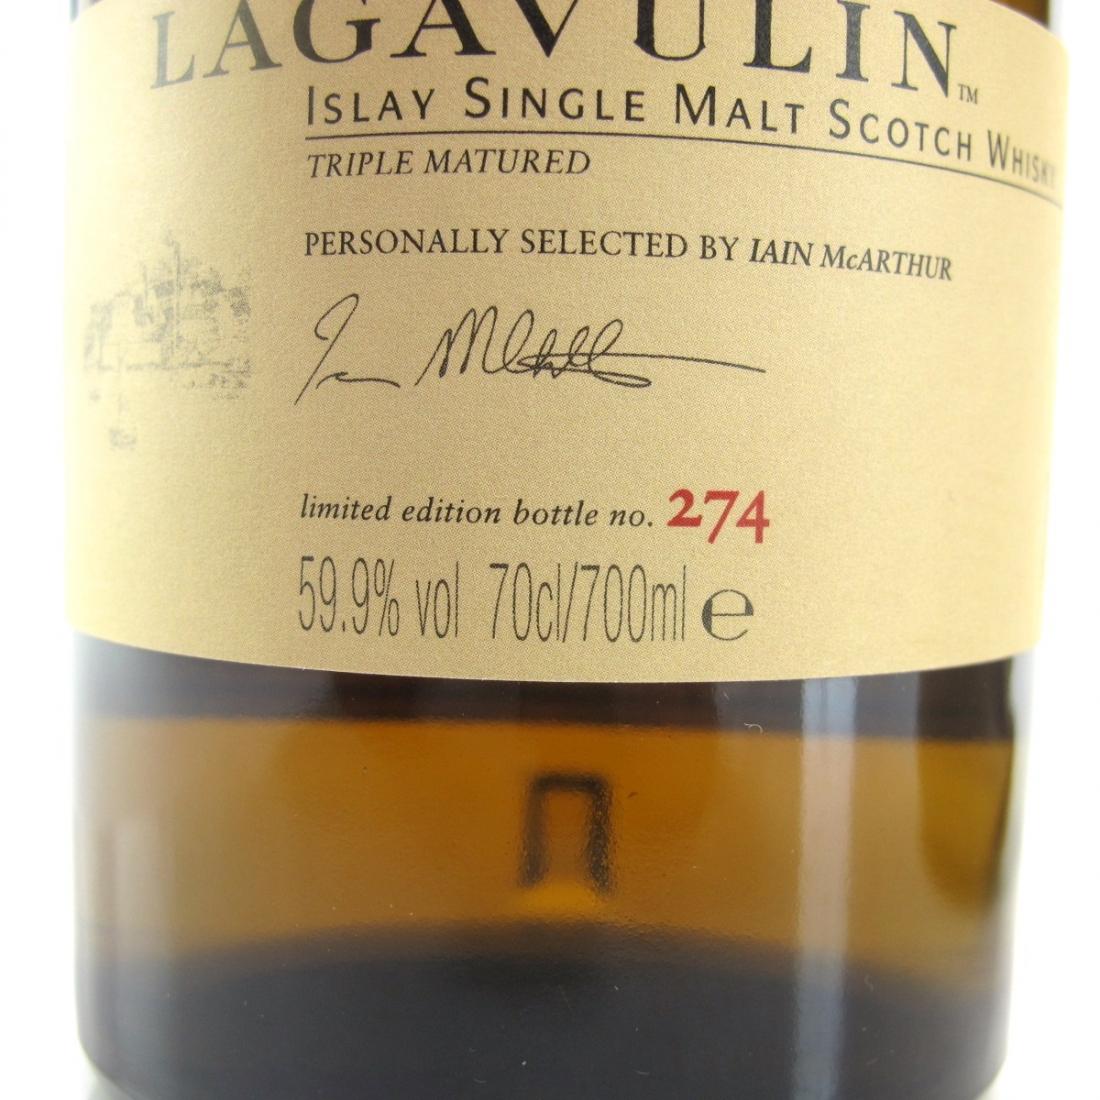 Lagavulin 1991 Feis Ile 2015 24 Year Old